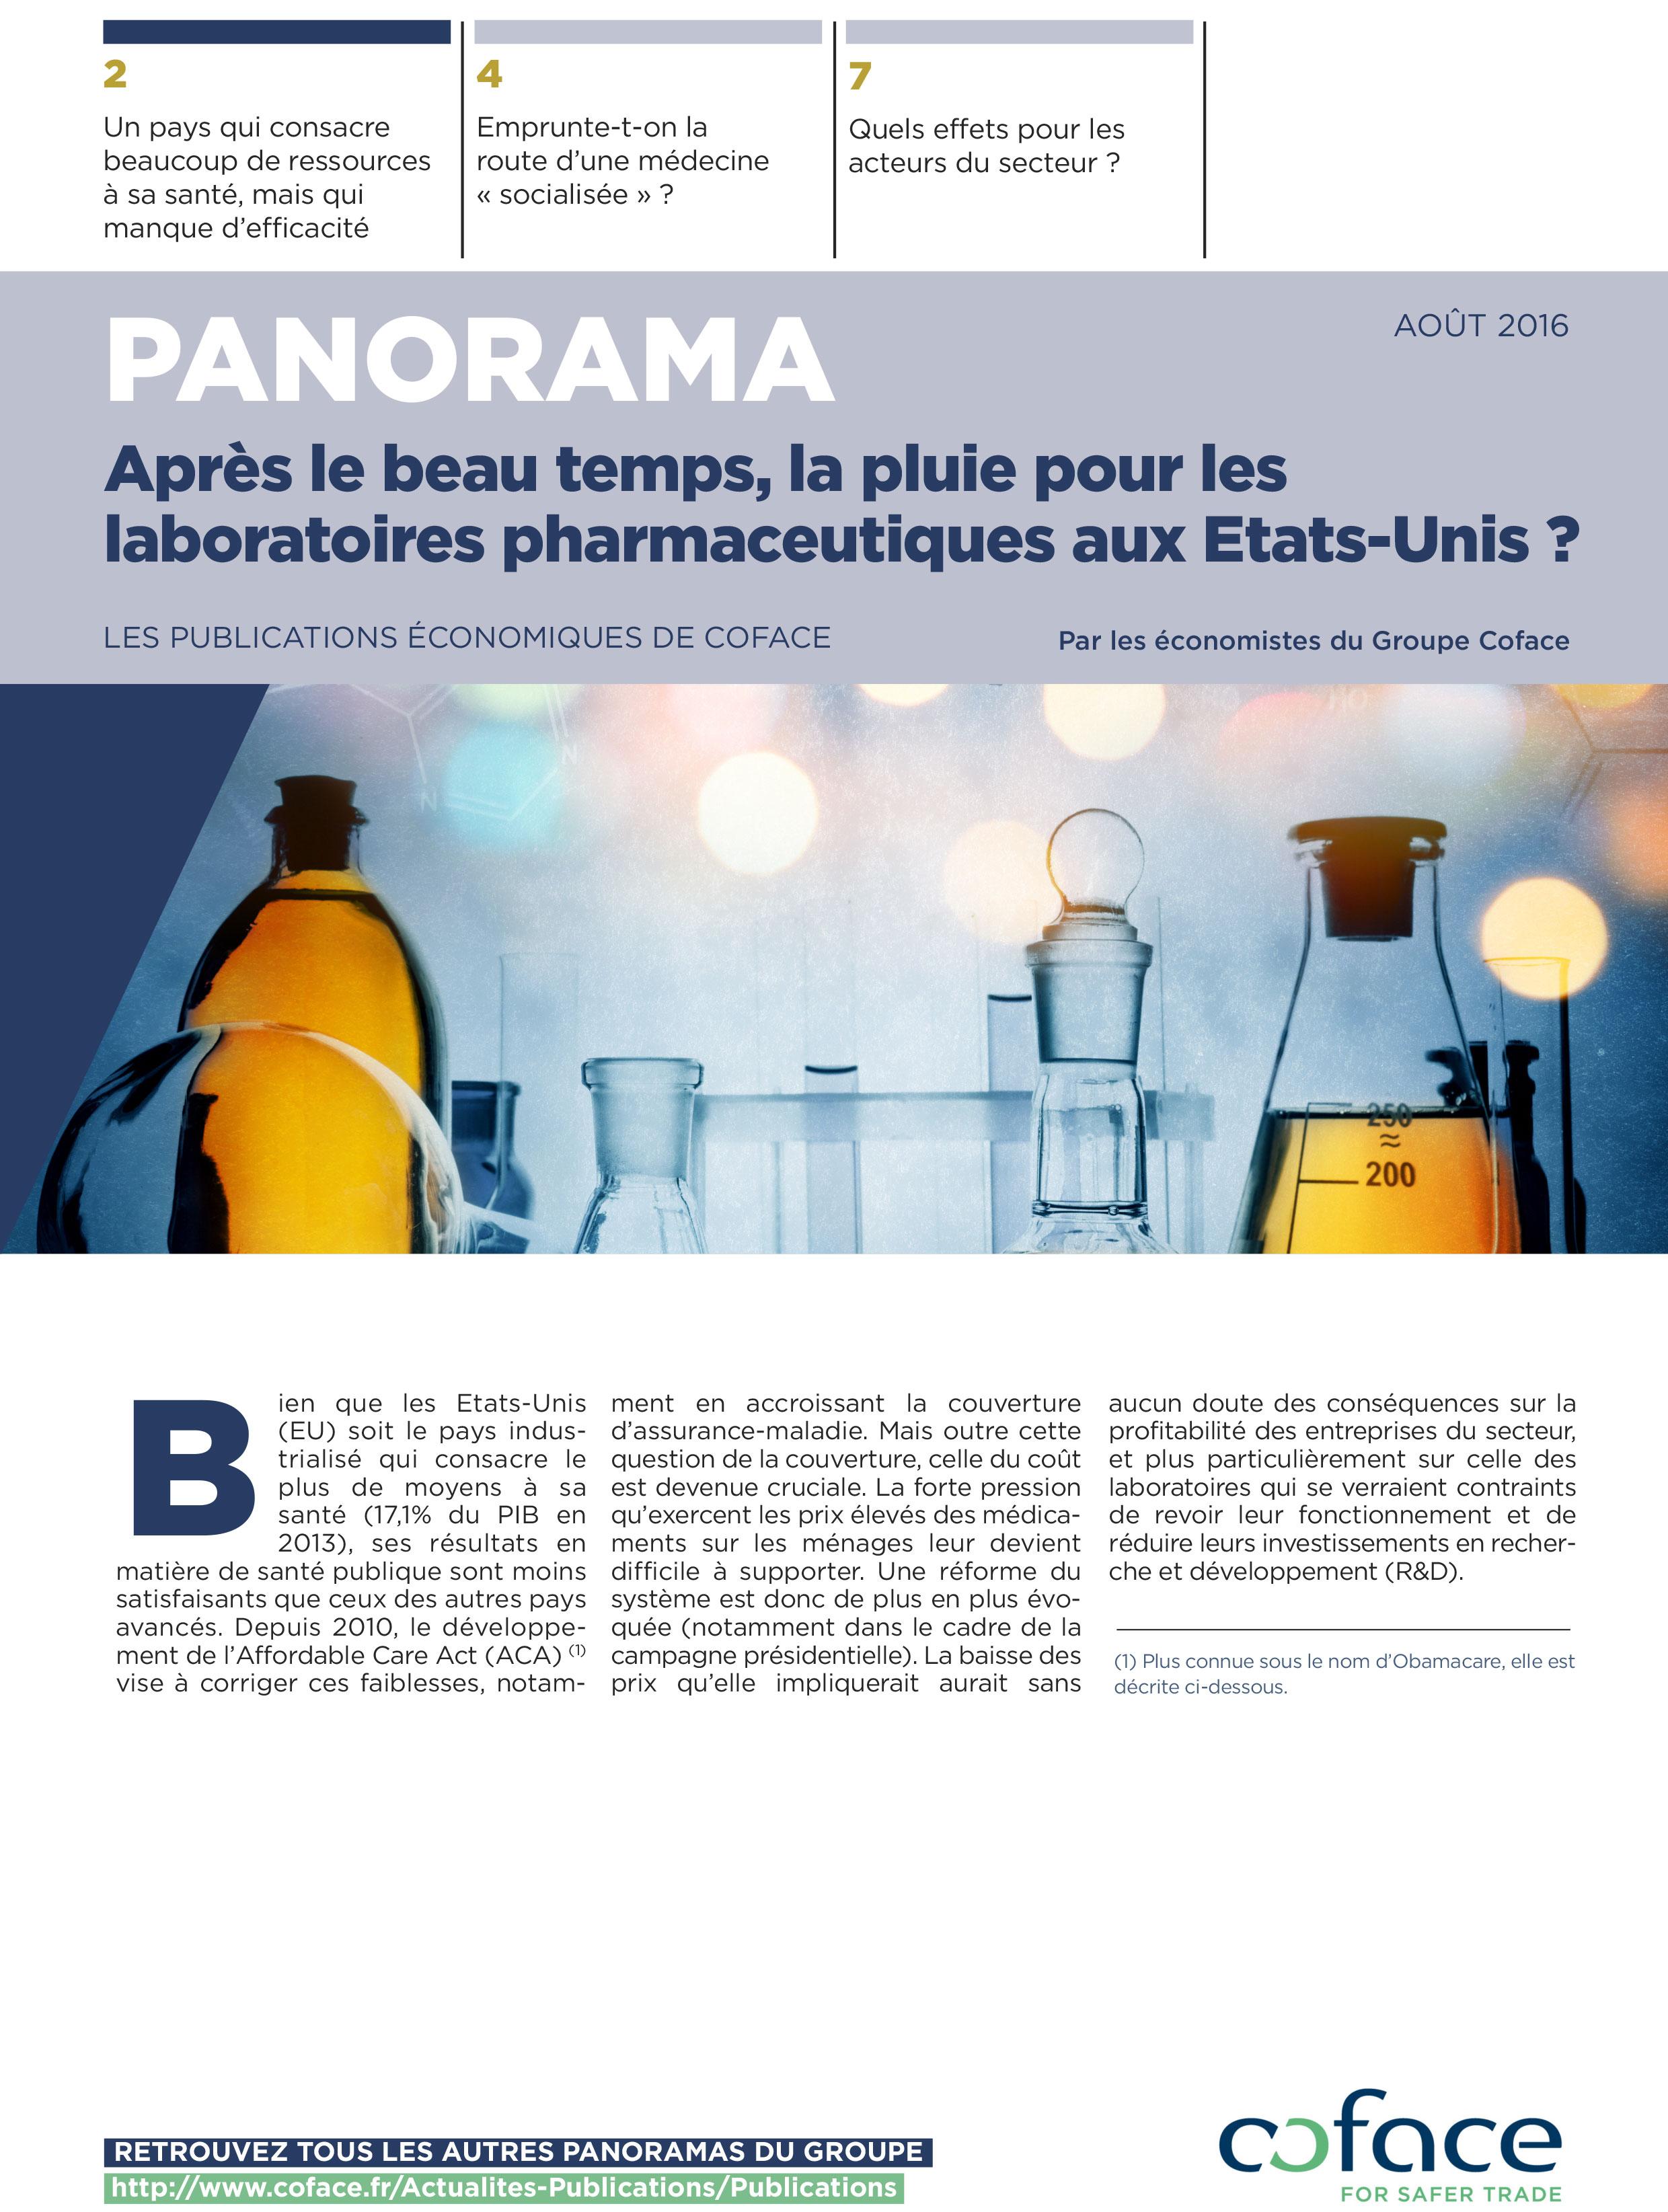 Panorama-Pharmacie+aout+2016-FR-WEB